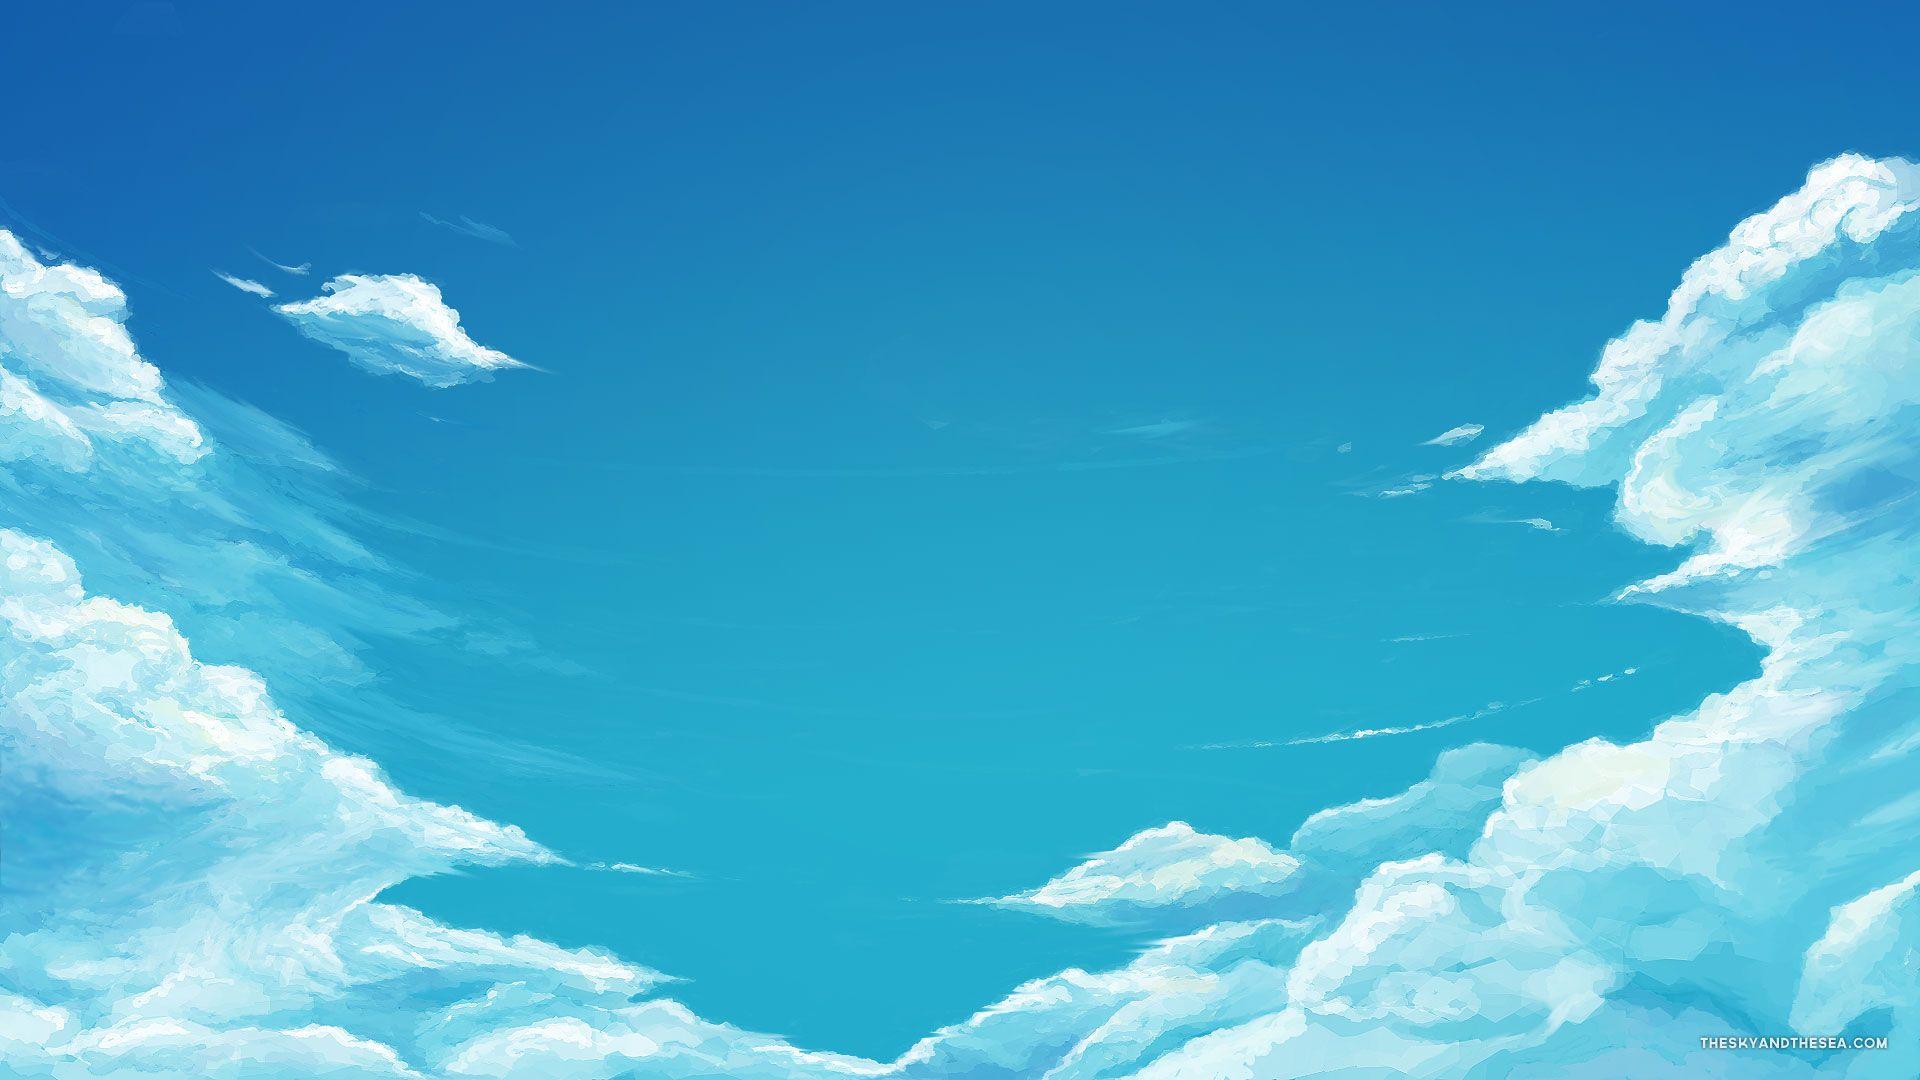 Cartoon Blue Sky Hd Wallpaper Wallpaper List Sky Anime Sky Aesthetic Anime Scenery Wallpaper